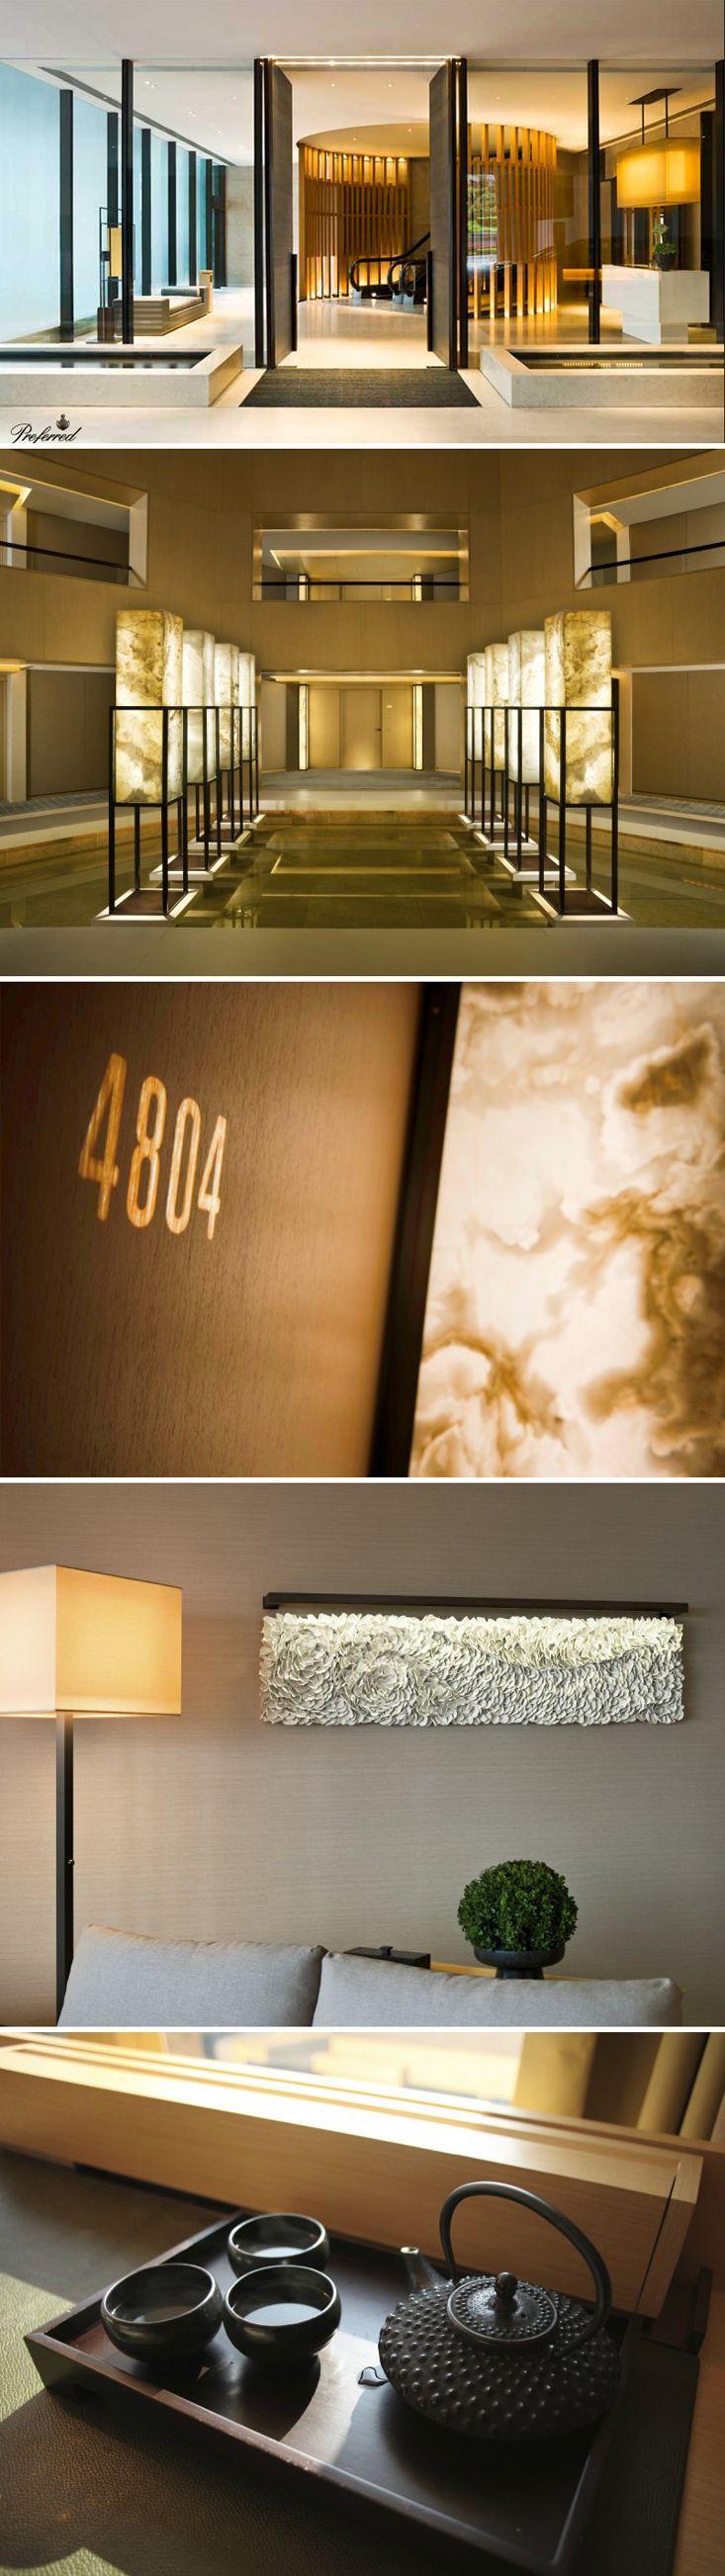 The Upper House_Hong Kong by Andre Fu_AFSO Design Studio_HK  More at Interior Design Shop http://interiordesignshop.net/